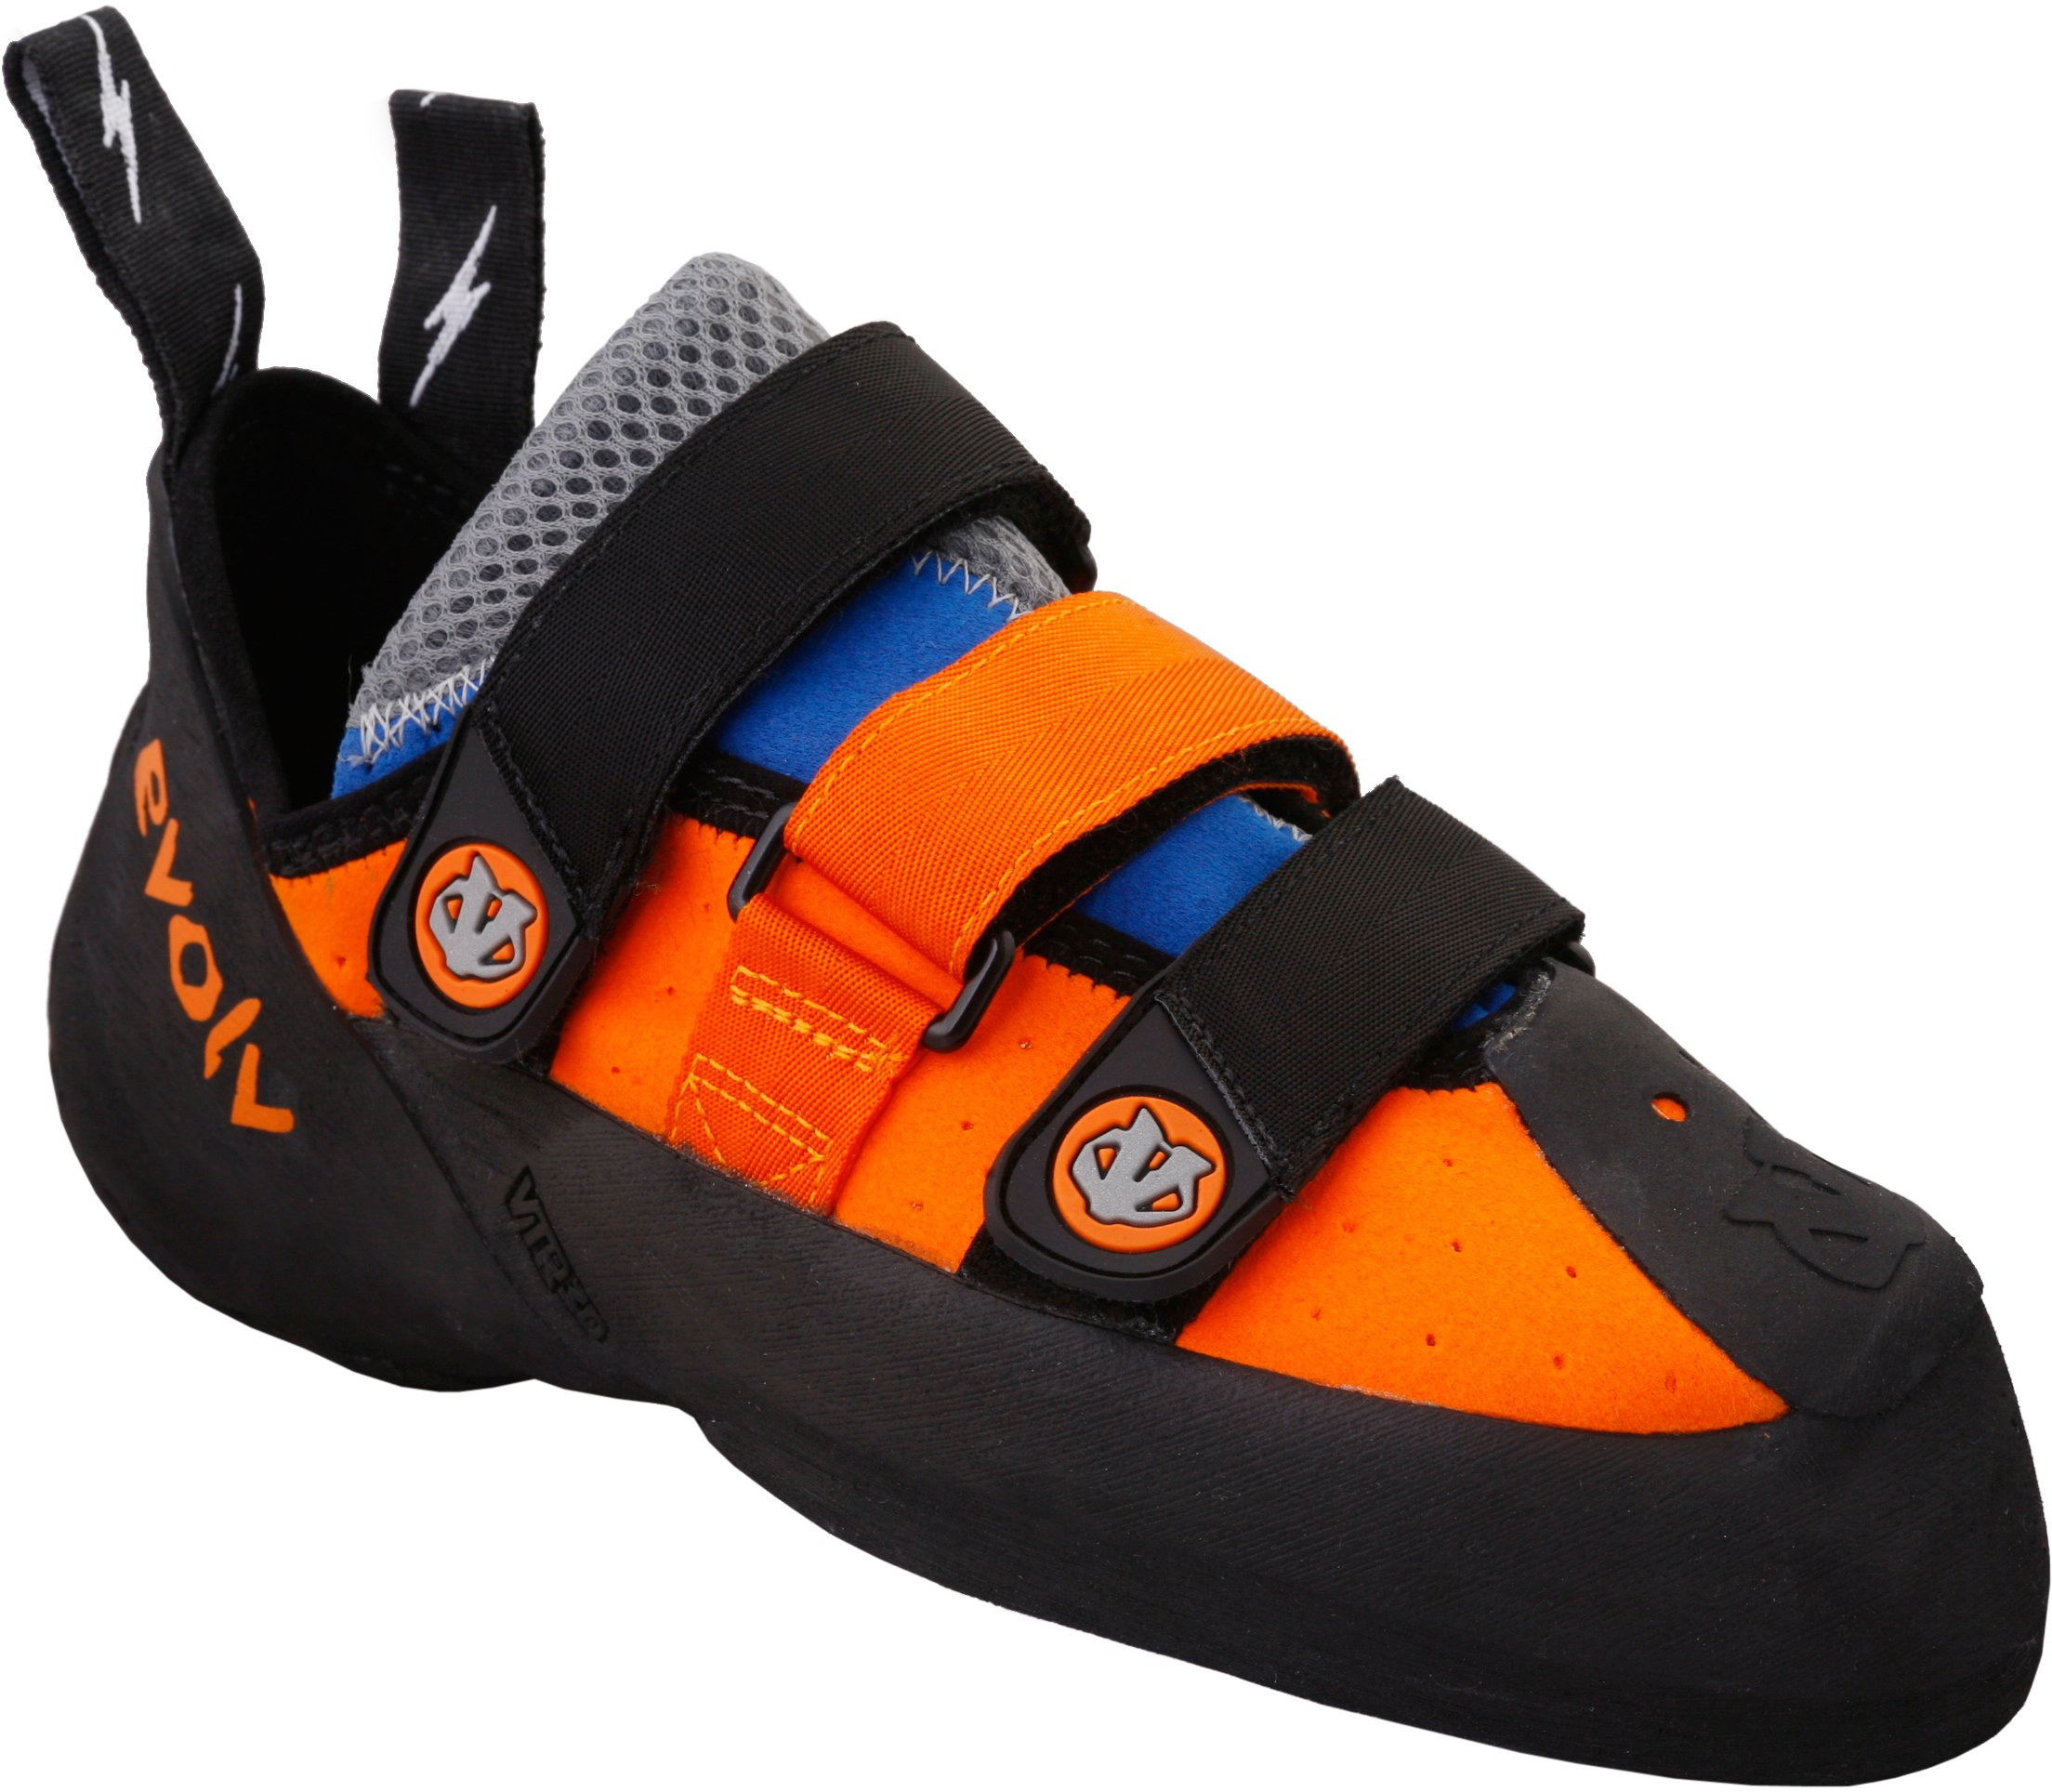 Evolv Men's Shaman Climbing Shoe,Orange/Blue,4.5 M US by Evolv